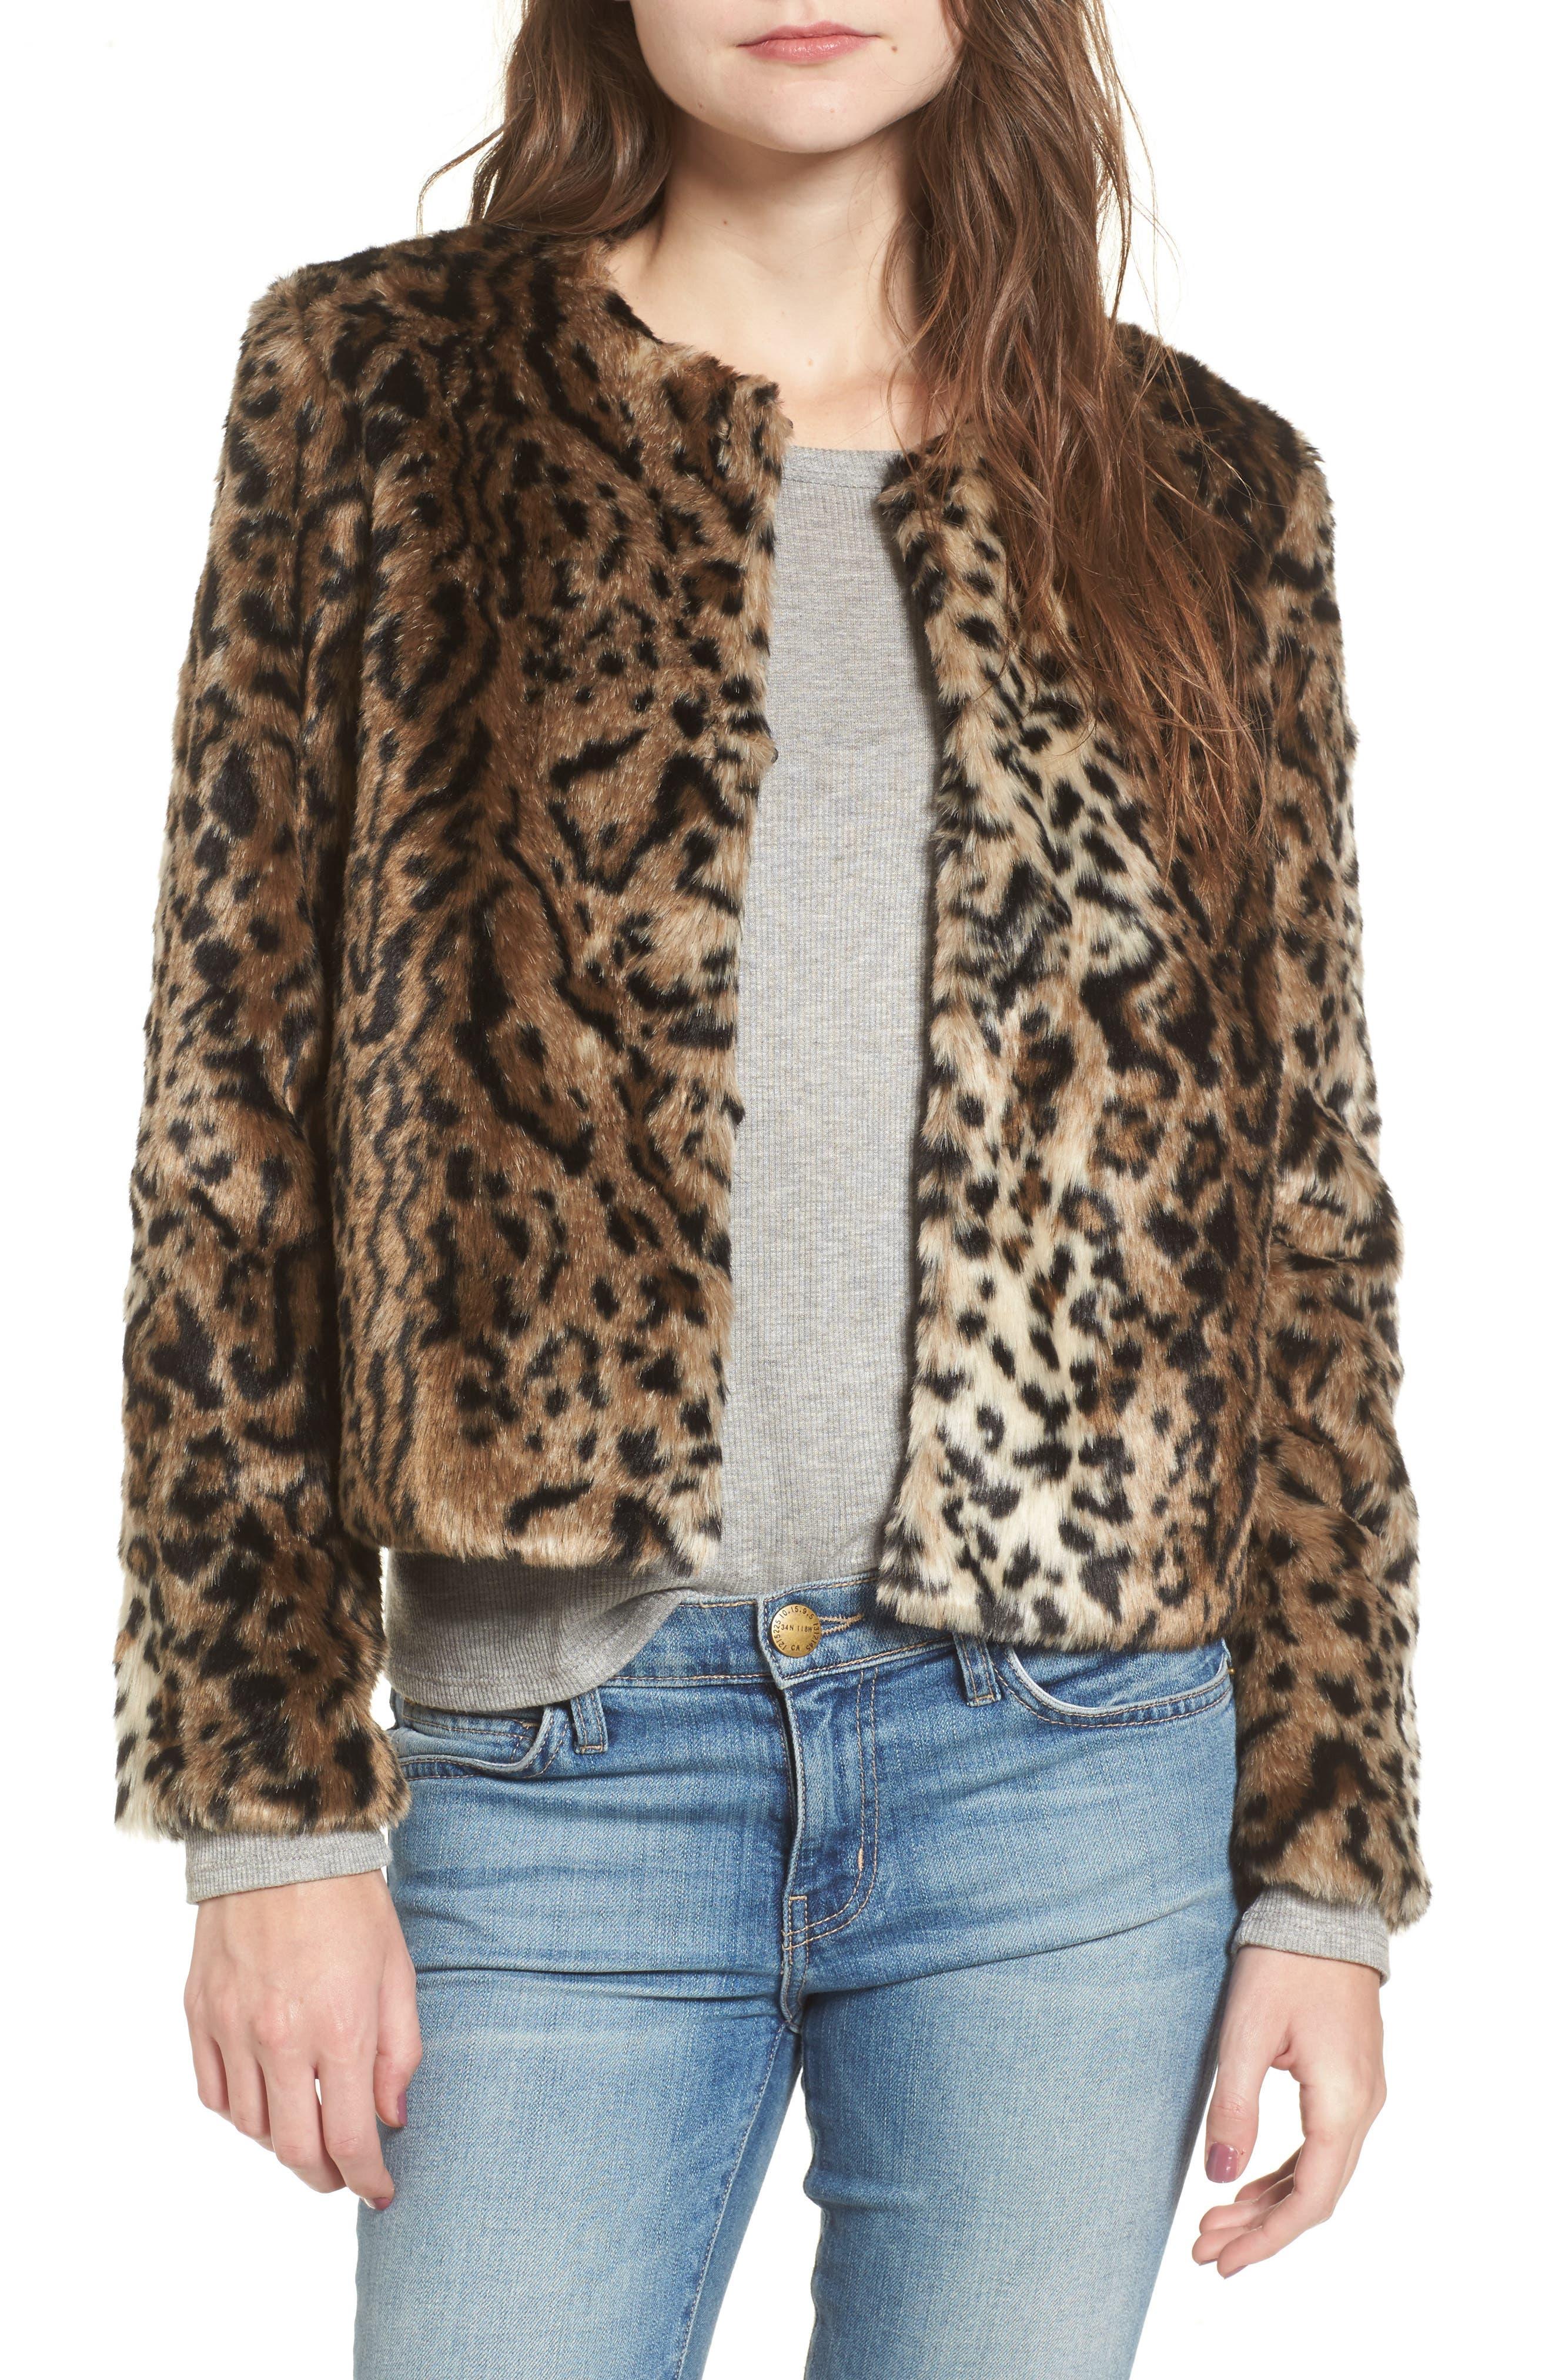 Alternate Image 1 Selected - BB Dakota McKinley Leopard Print Faux Fur Jacket